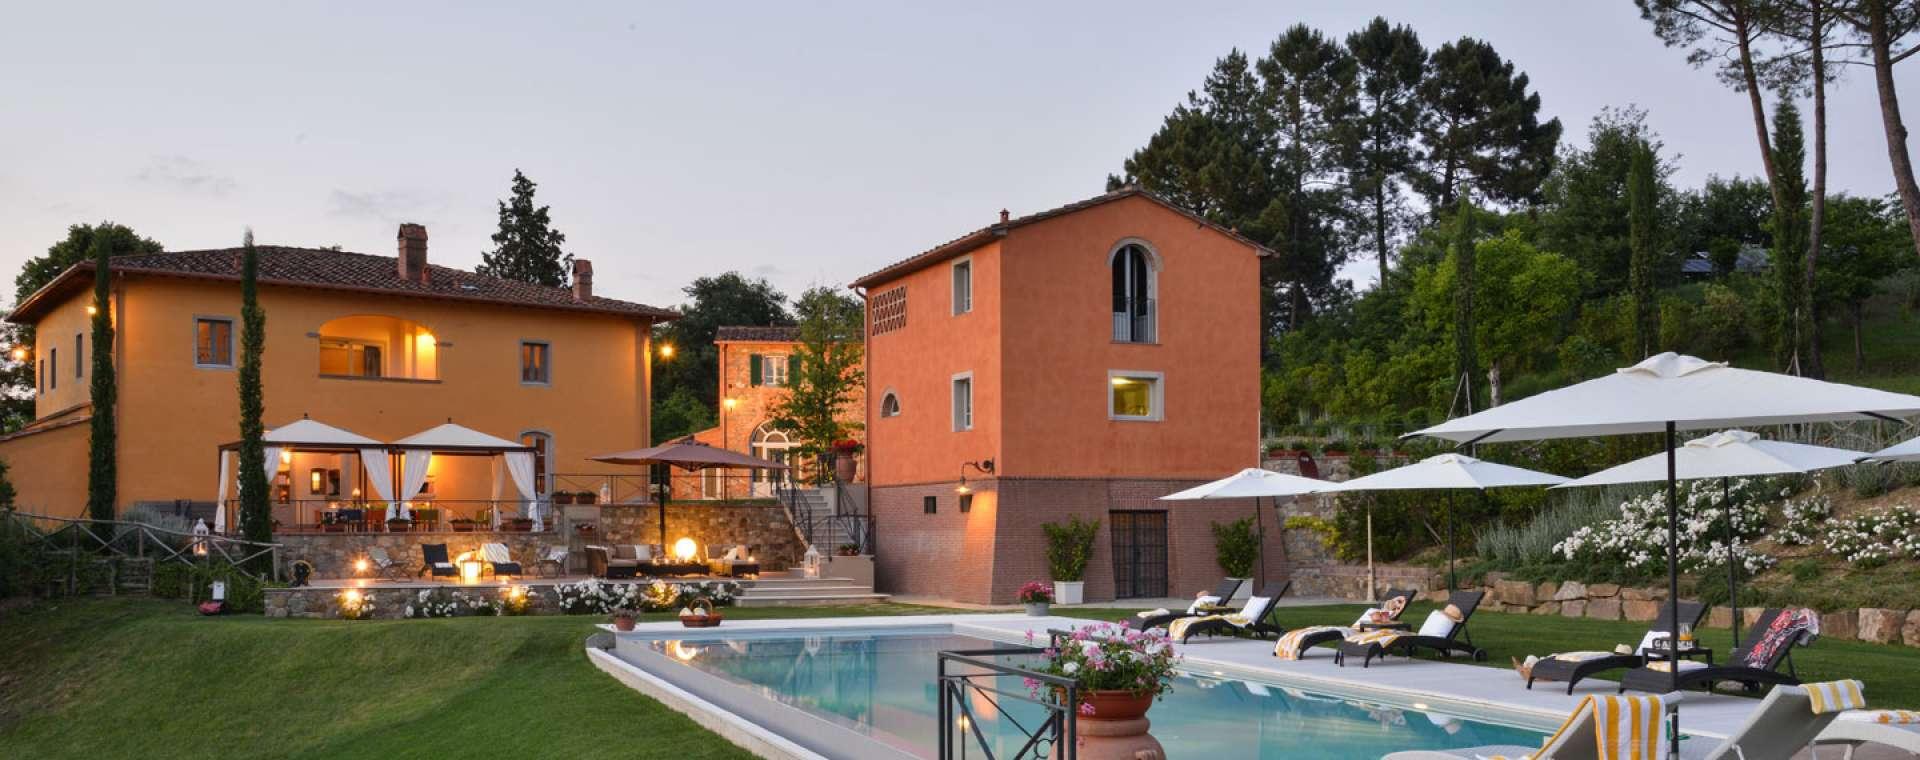 Renting a Villa in Chianti